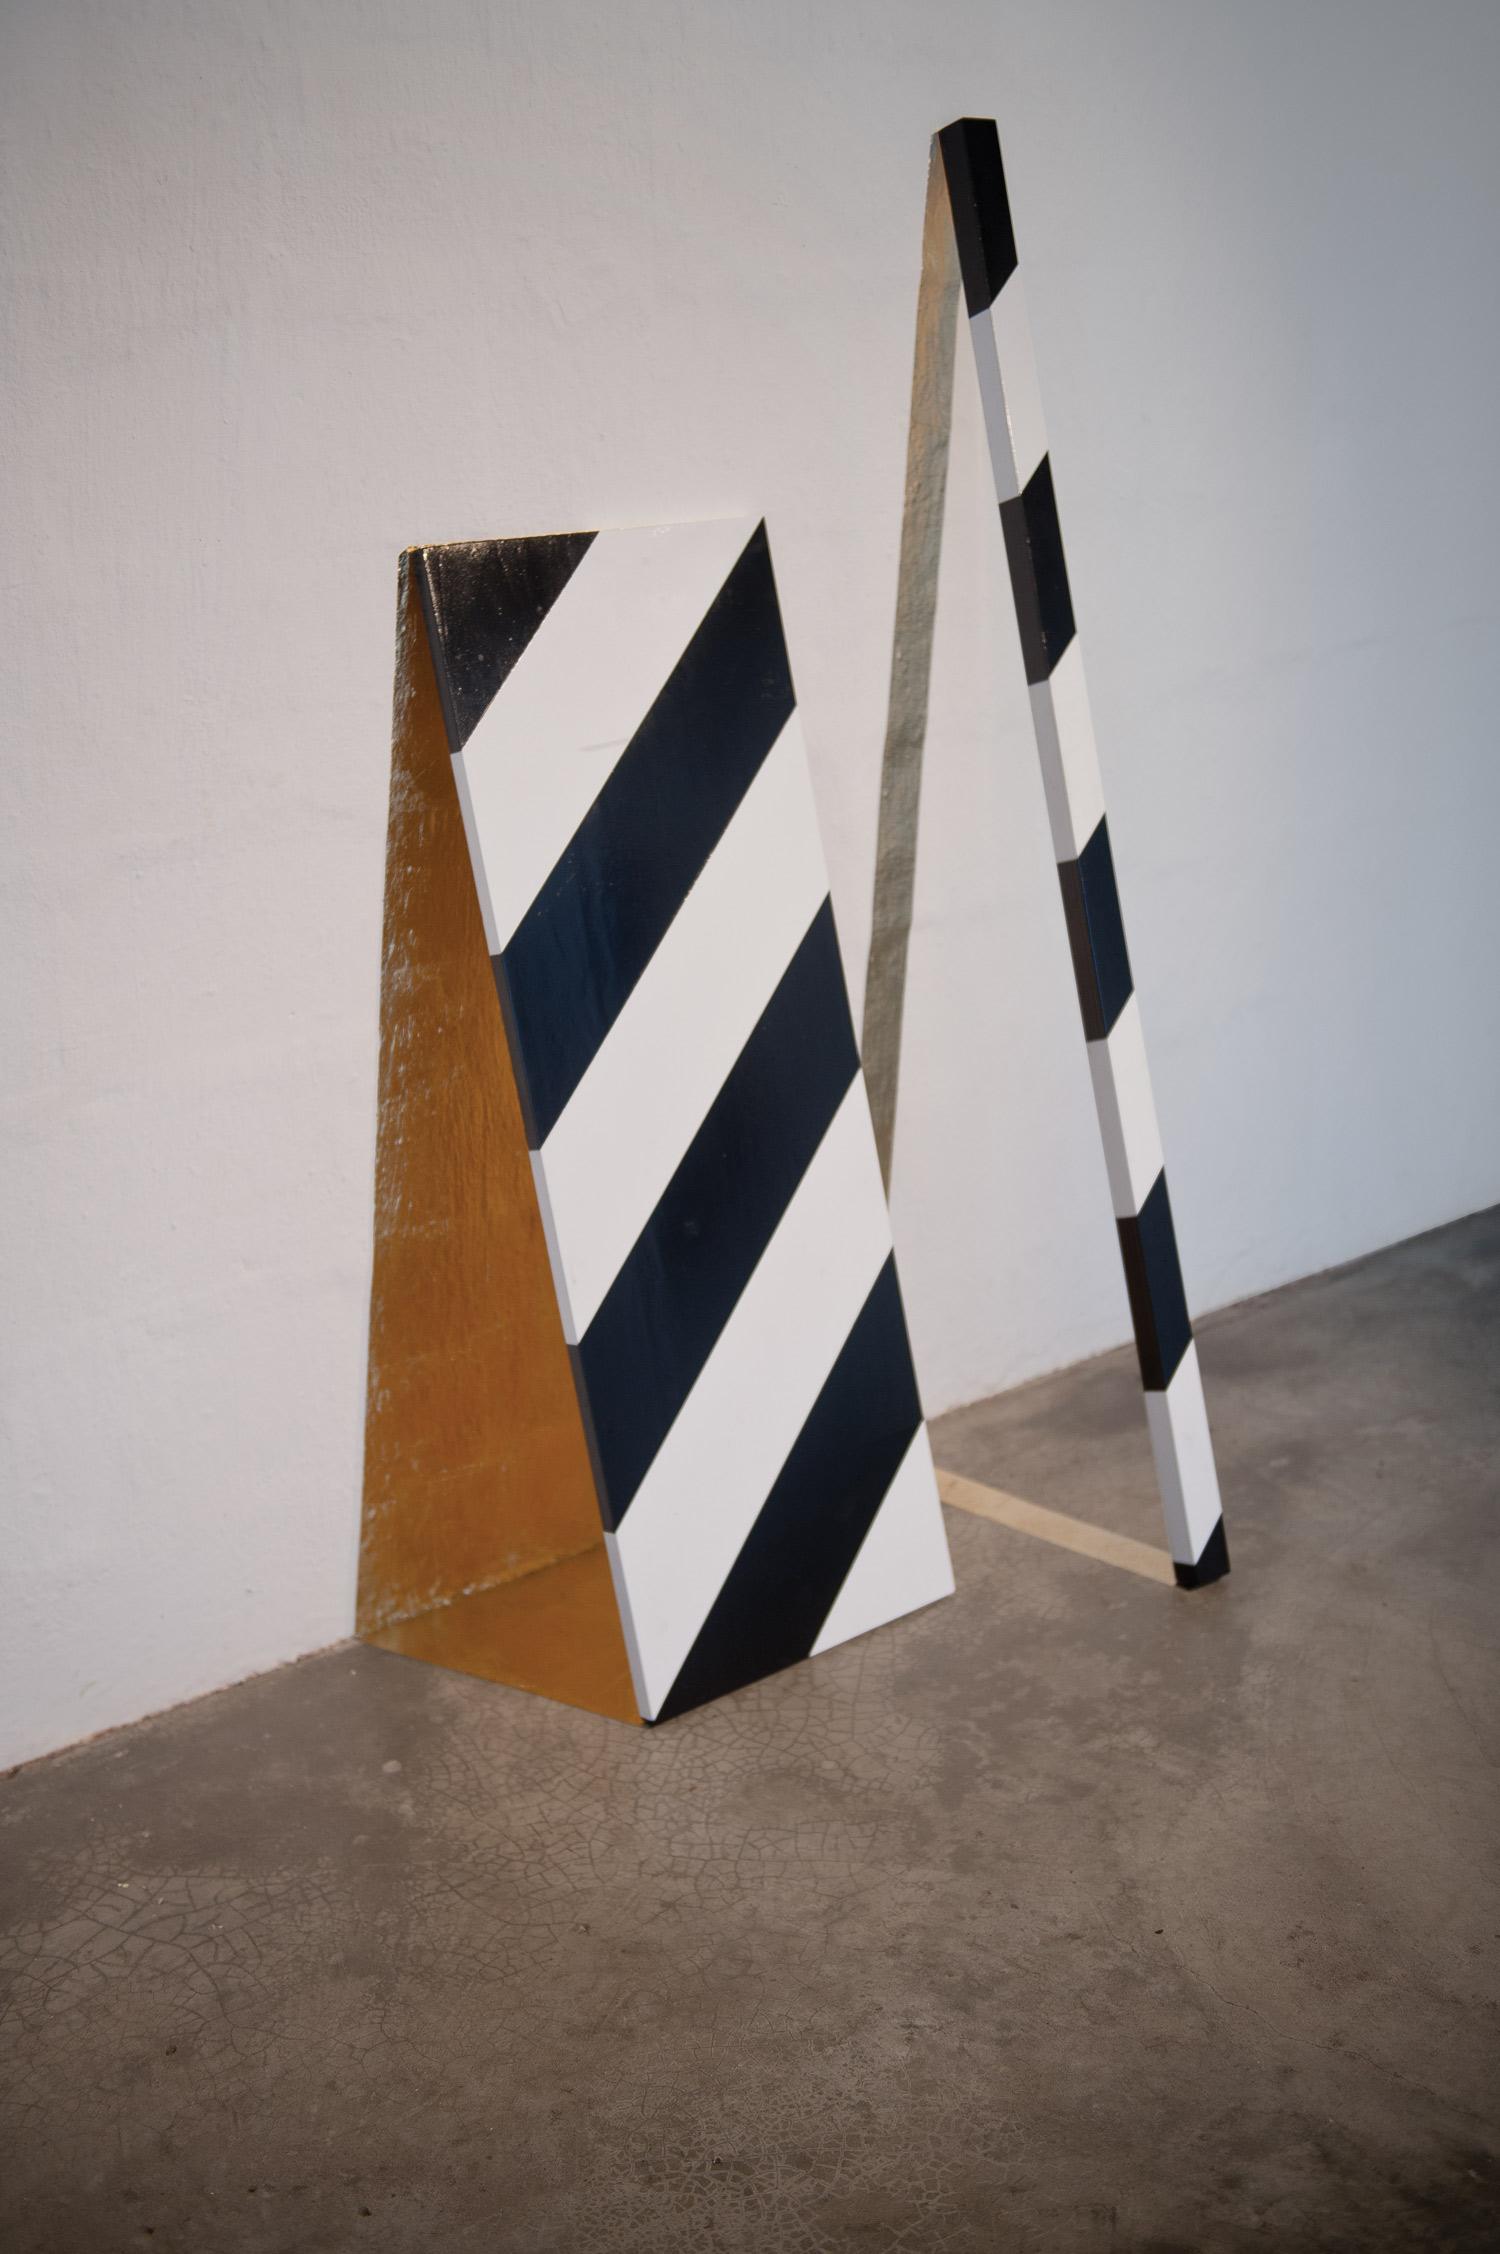 Geometric silence